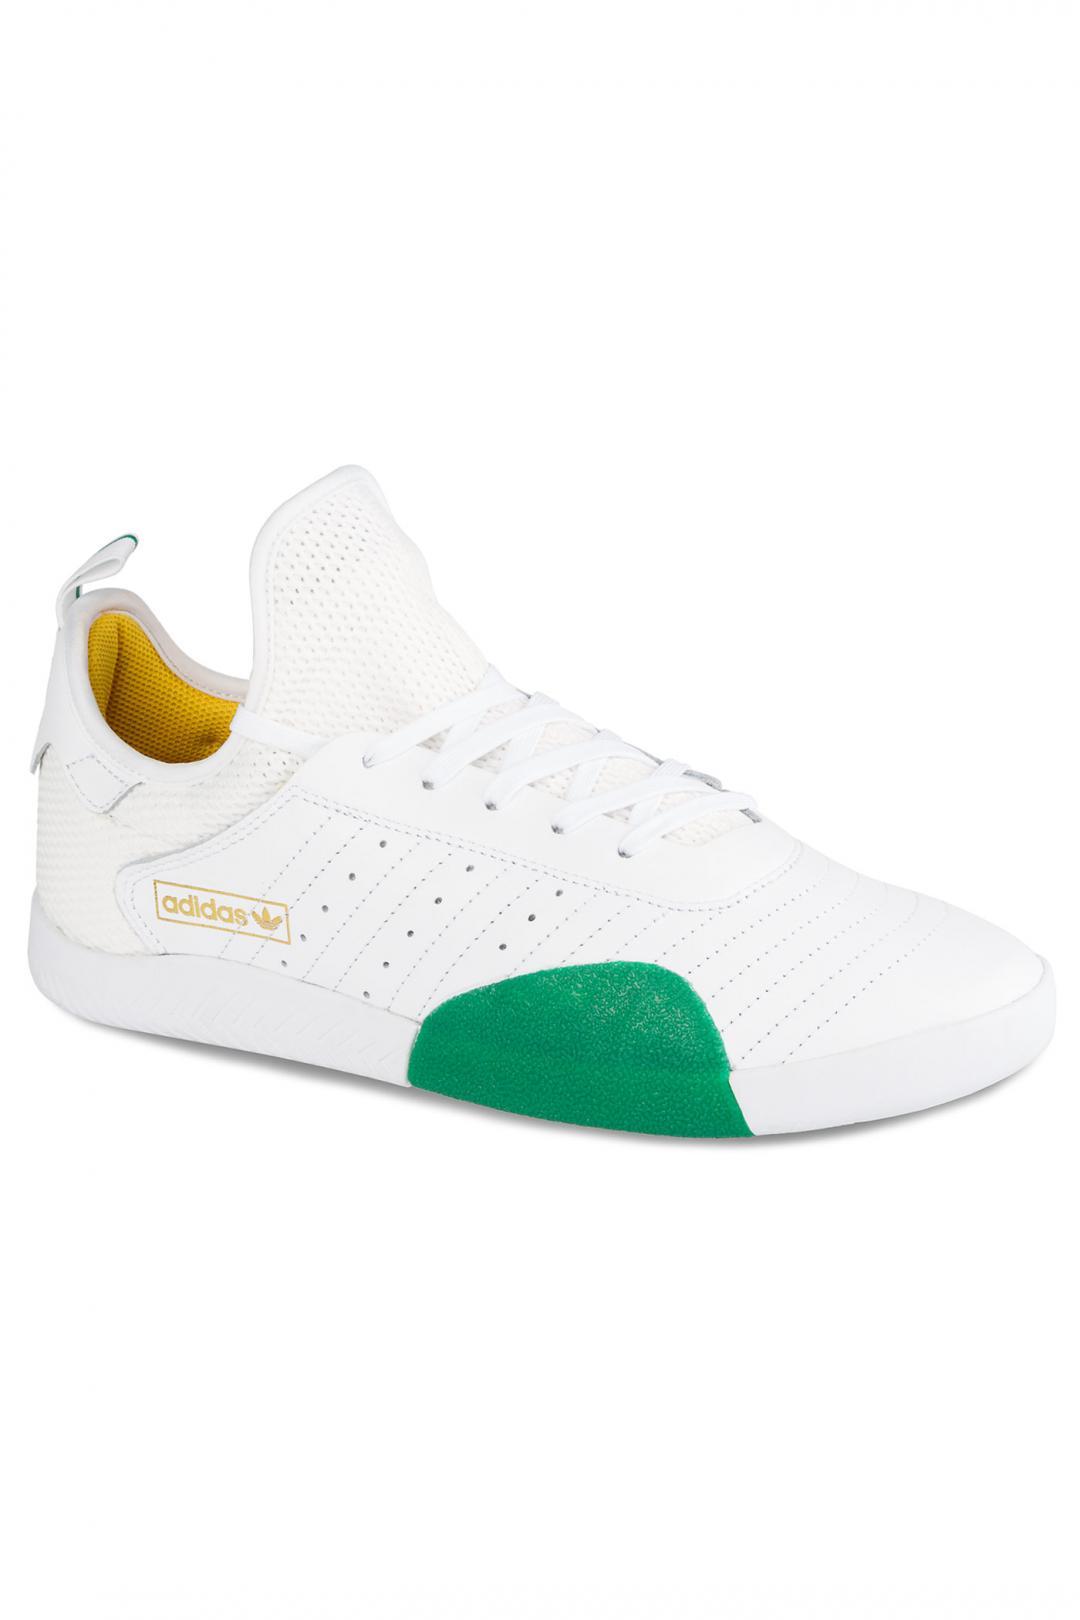 Uomo adidas Skateboarding x Nakel 3ST.003 white | Sneaker